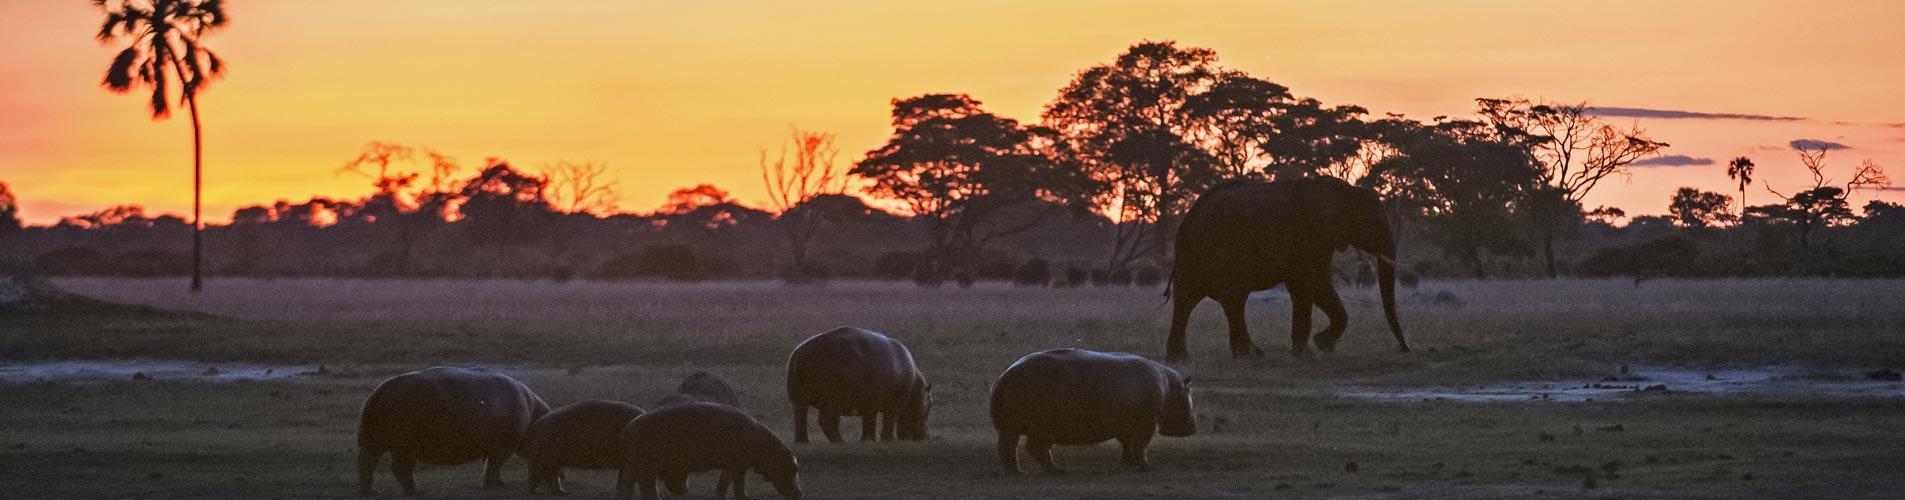 Hippos At Sunset on Zimbabwe Safari